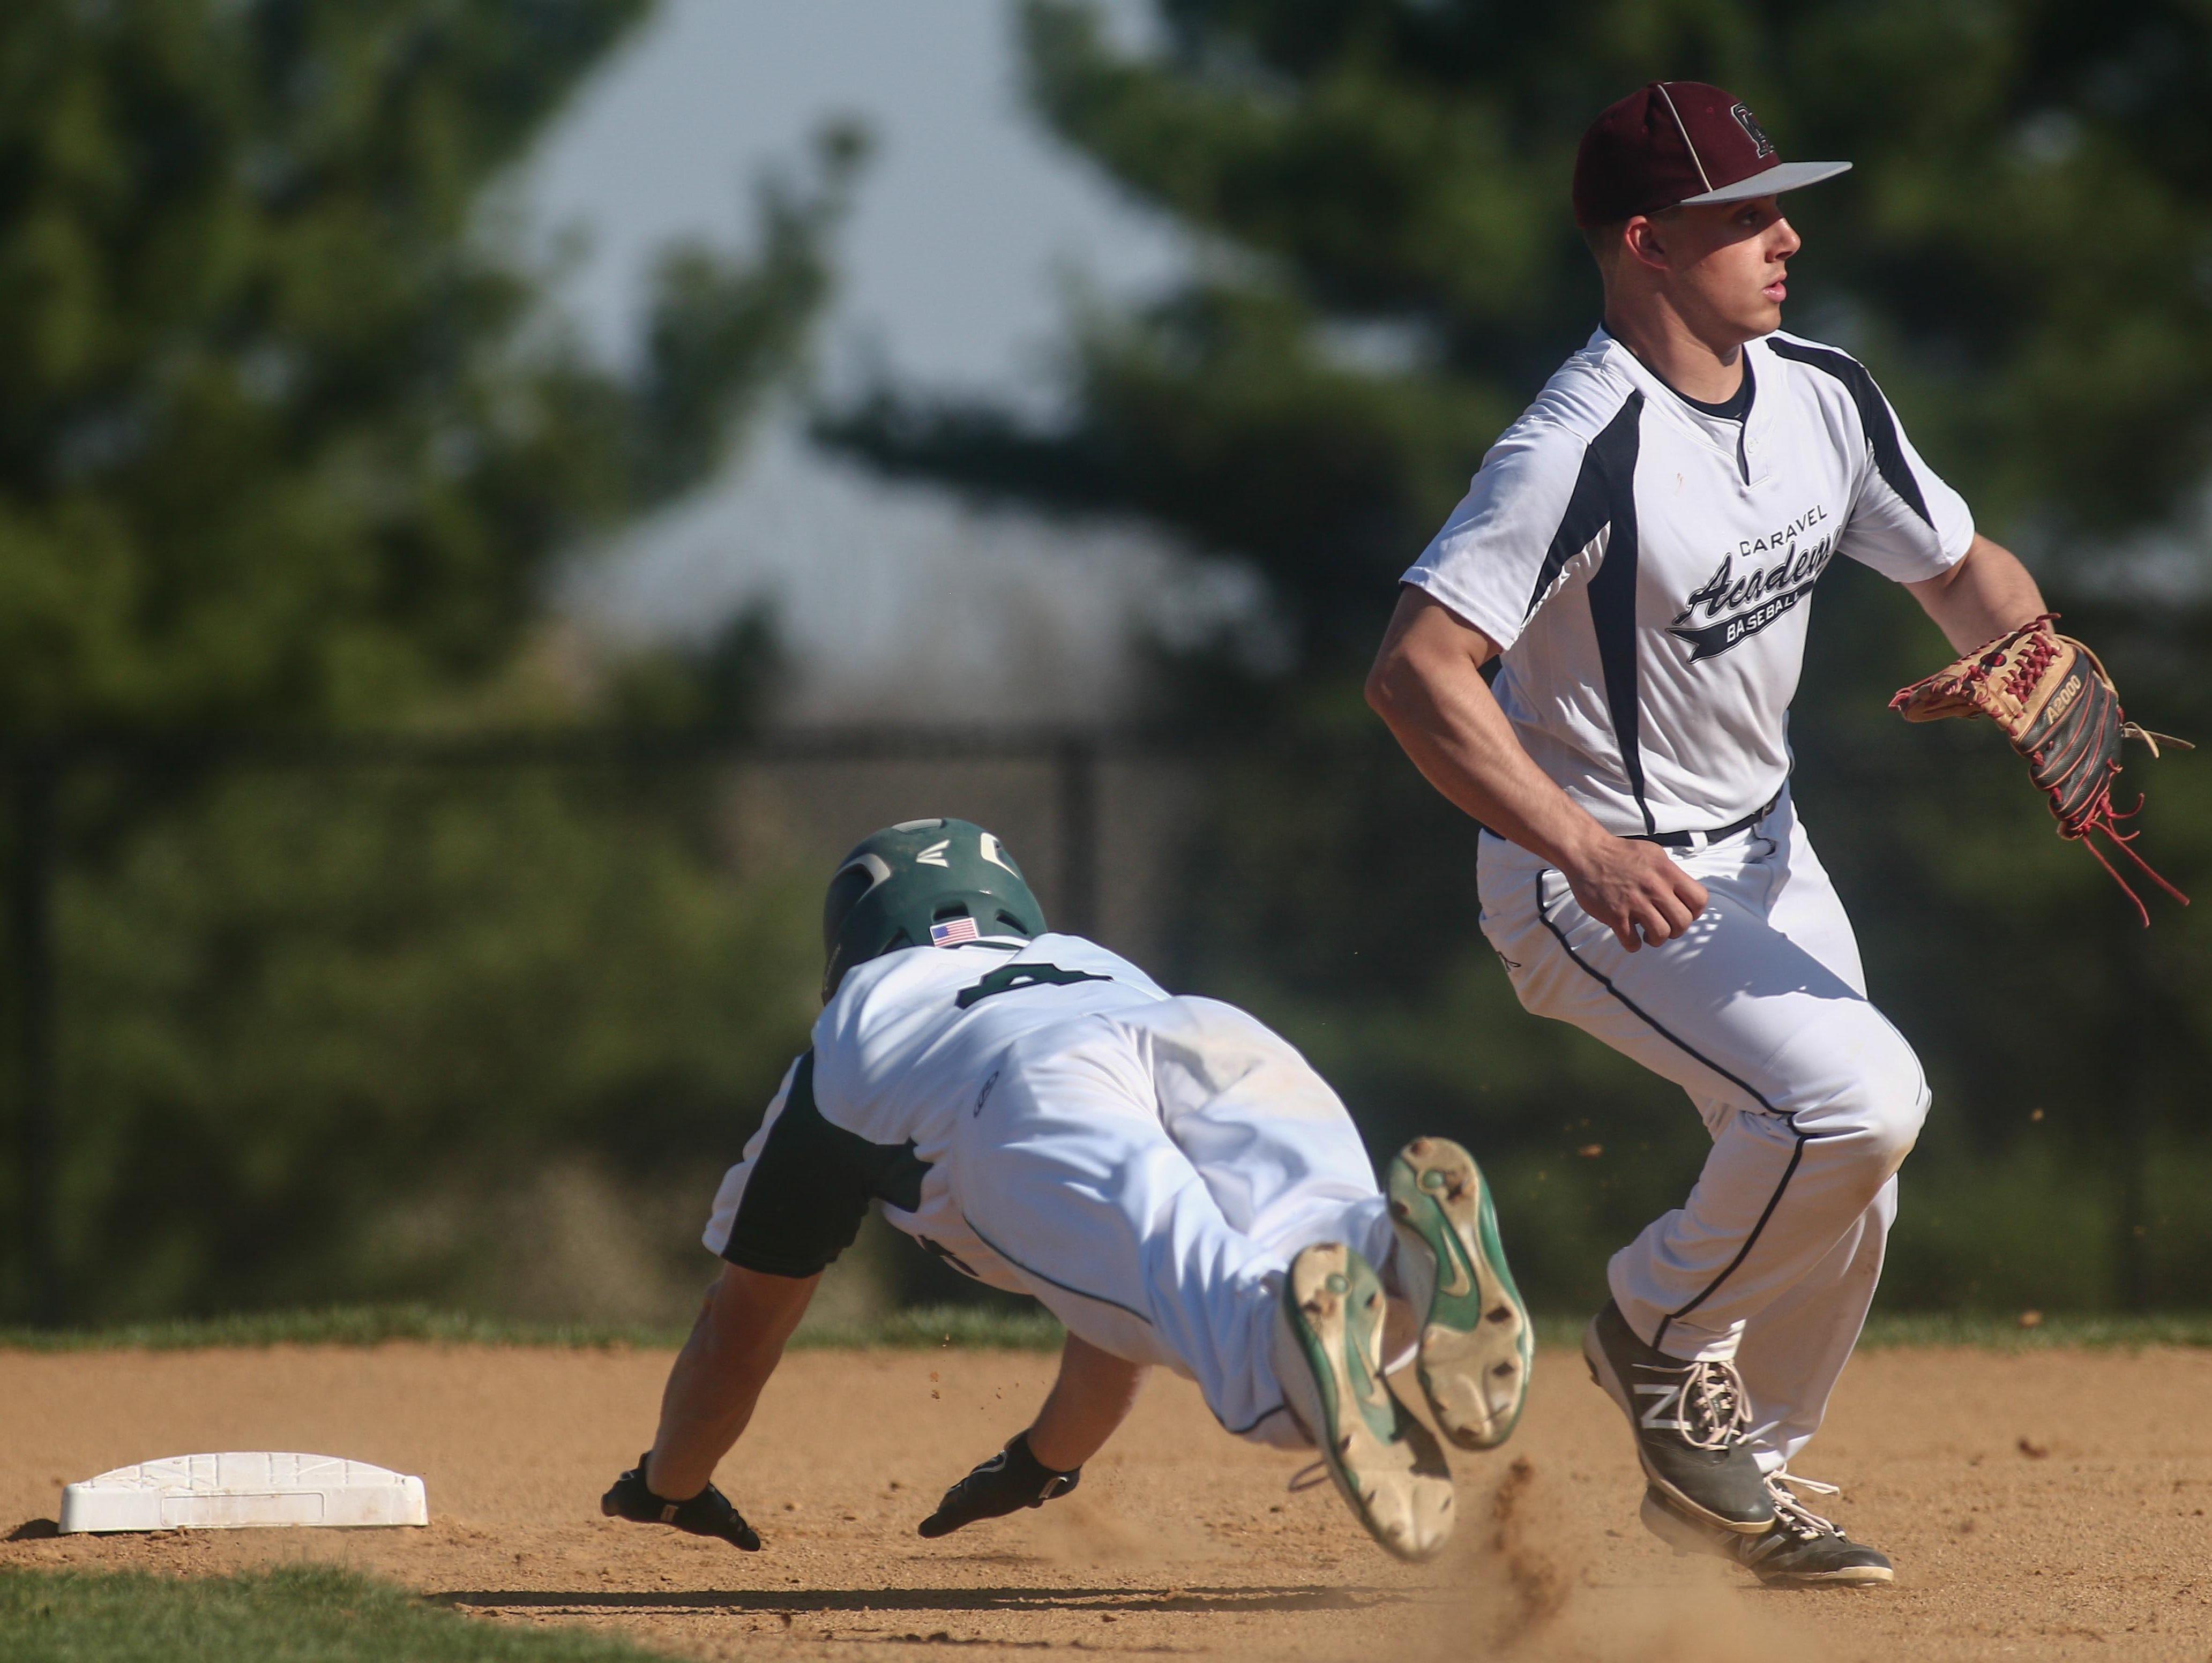 St. Mark's Jeremy Vogel (4) slides into second base during the third inning Thursday.